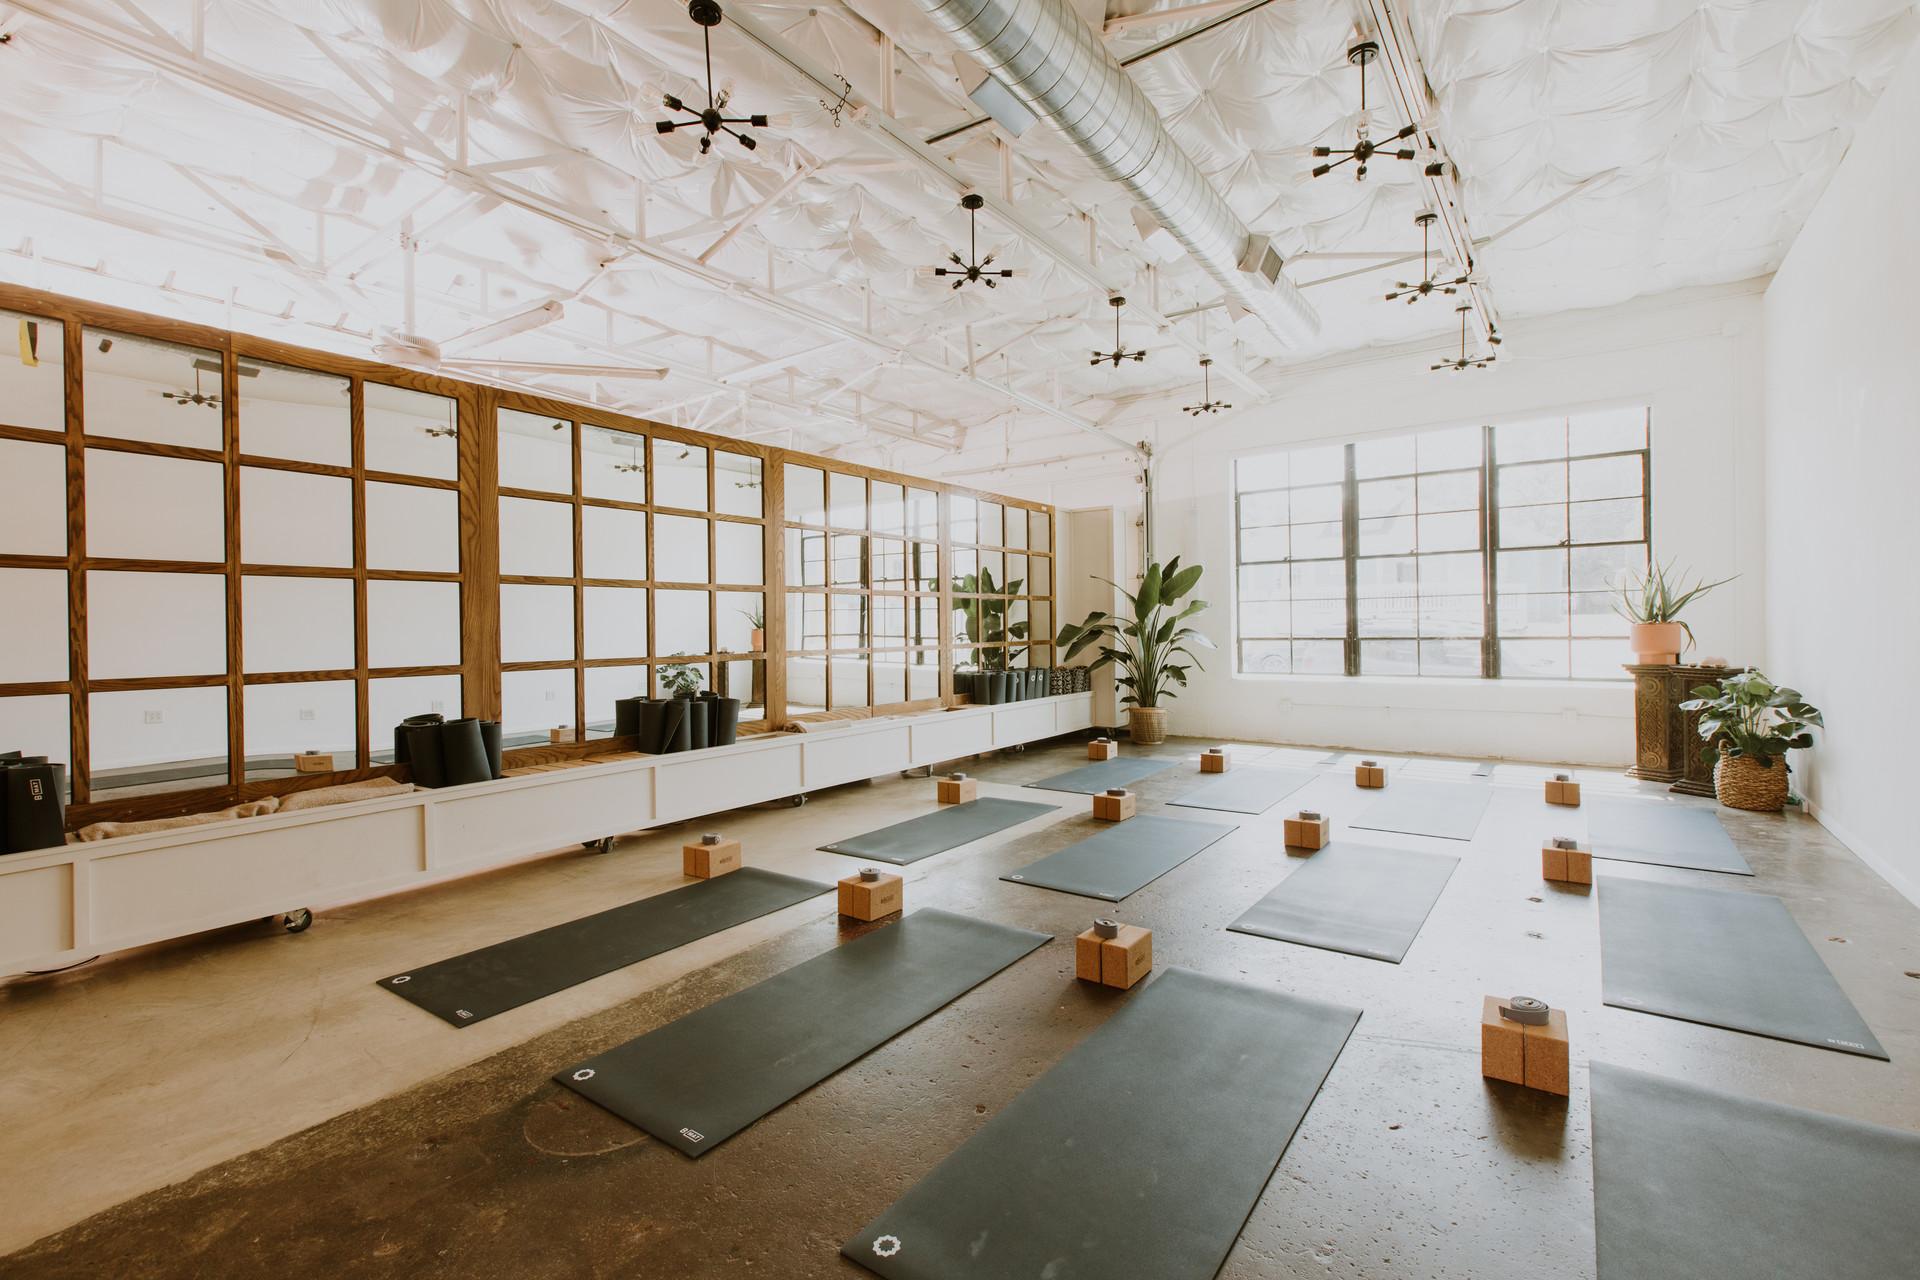 clemons-urban-hippie-yoga-9-19-20-hdr.jp